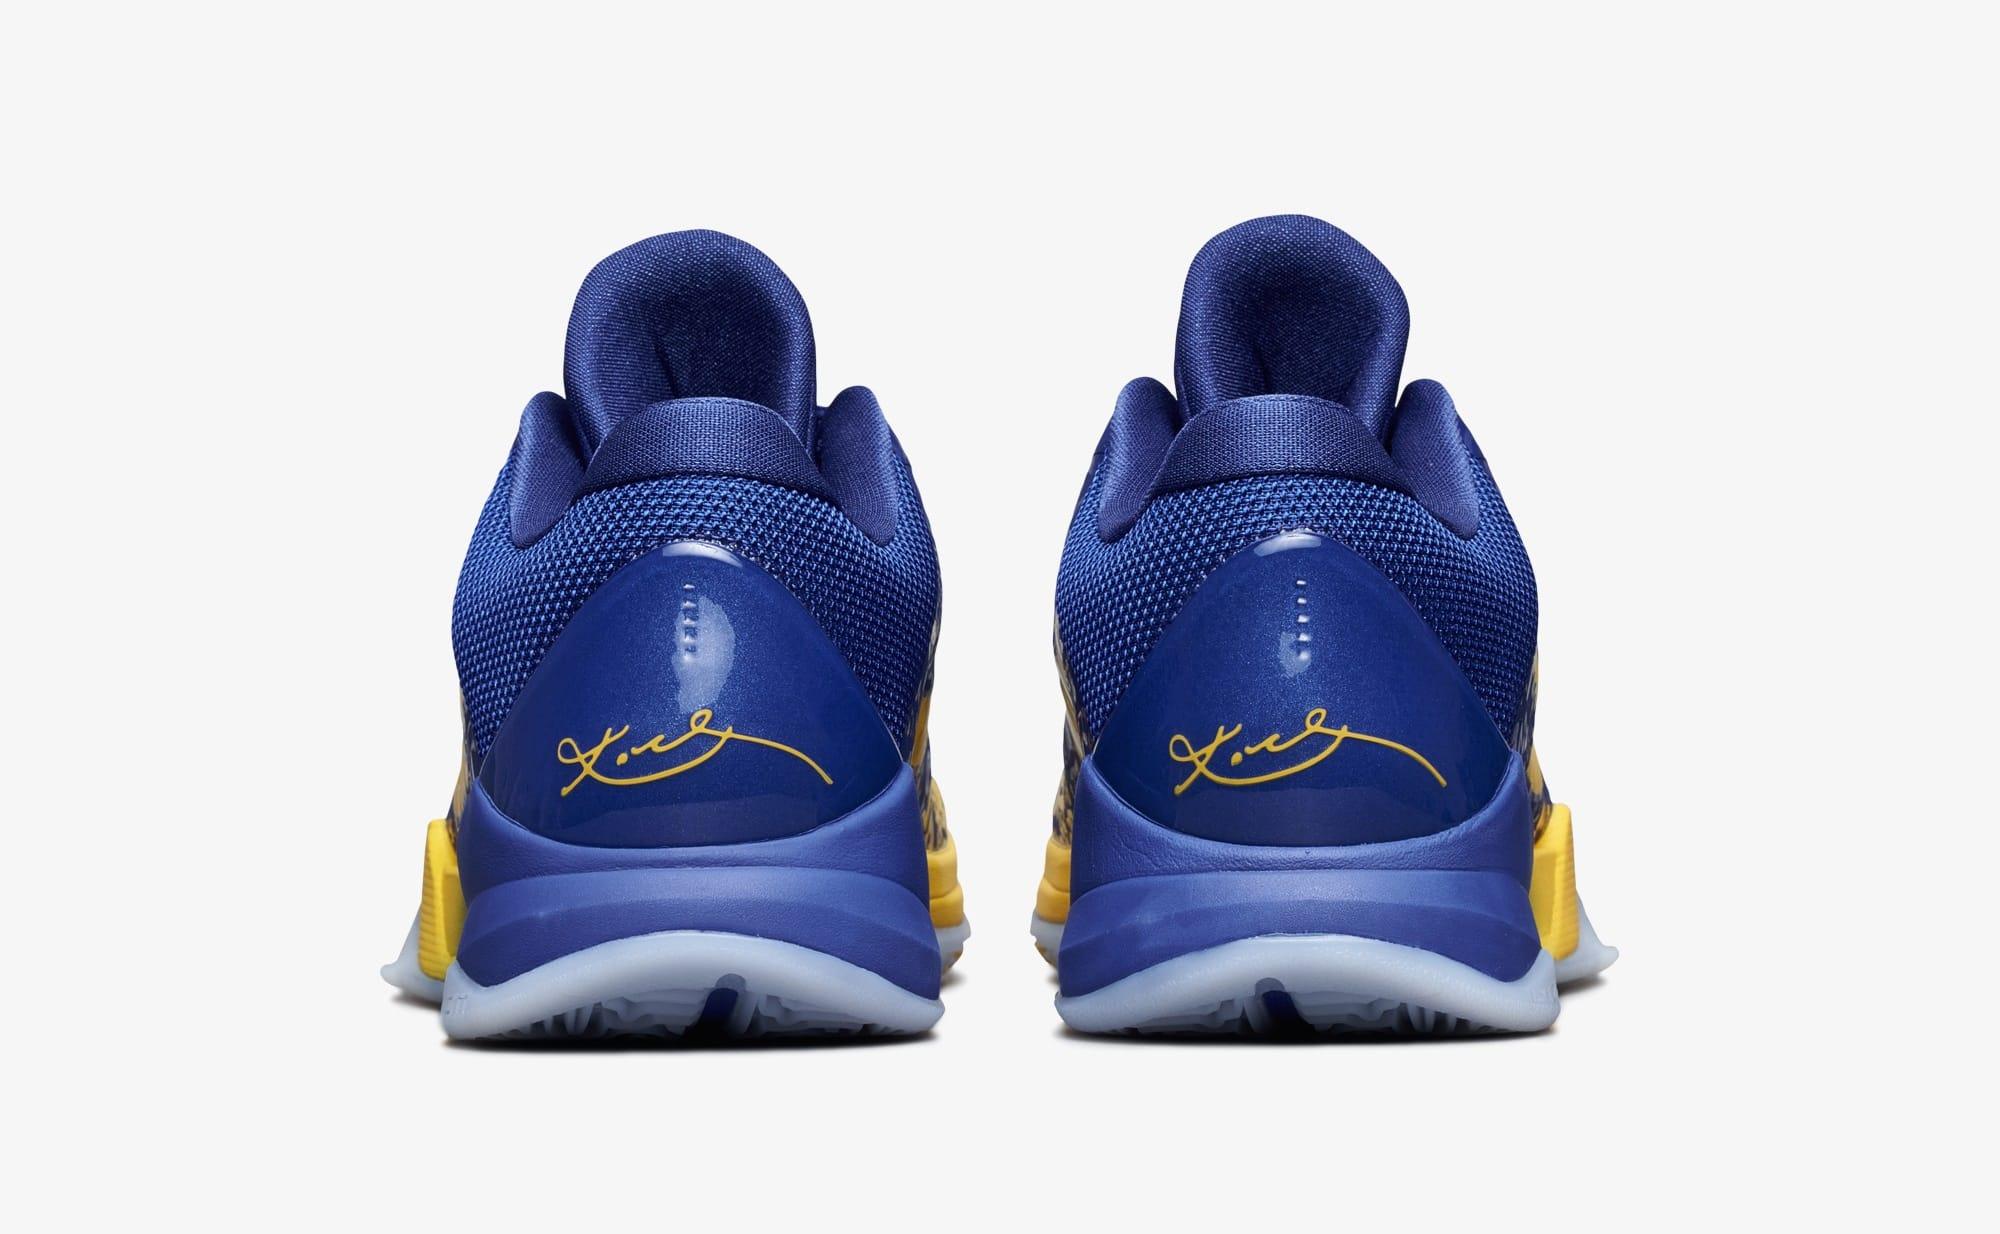 Nike Kobe 5 Protro 'Five Rings' CD4991-400 Heel